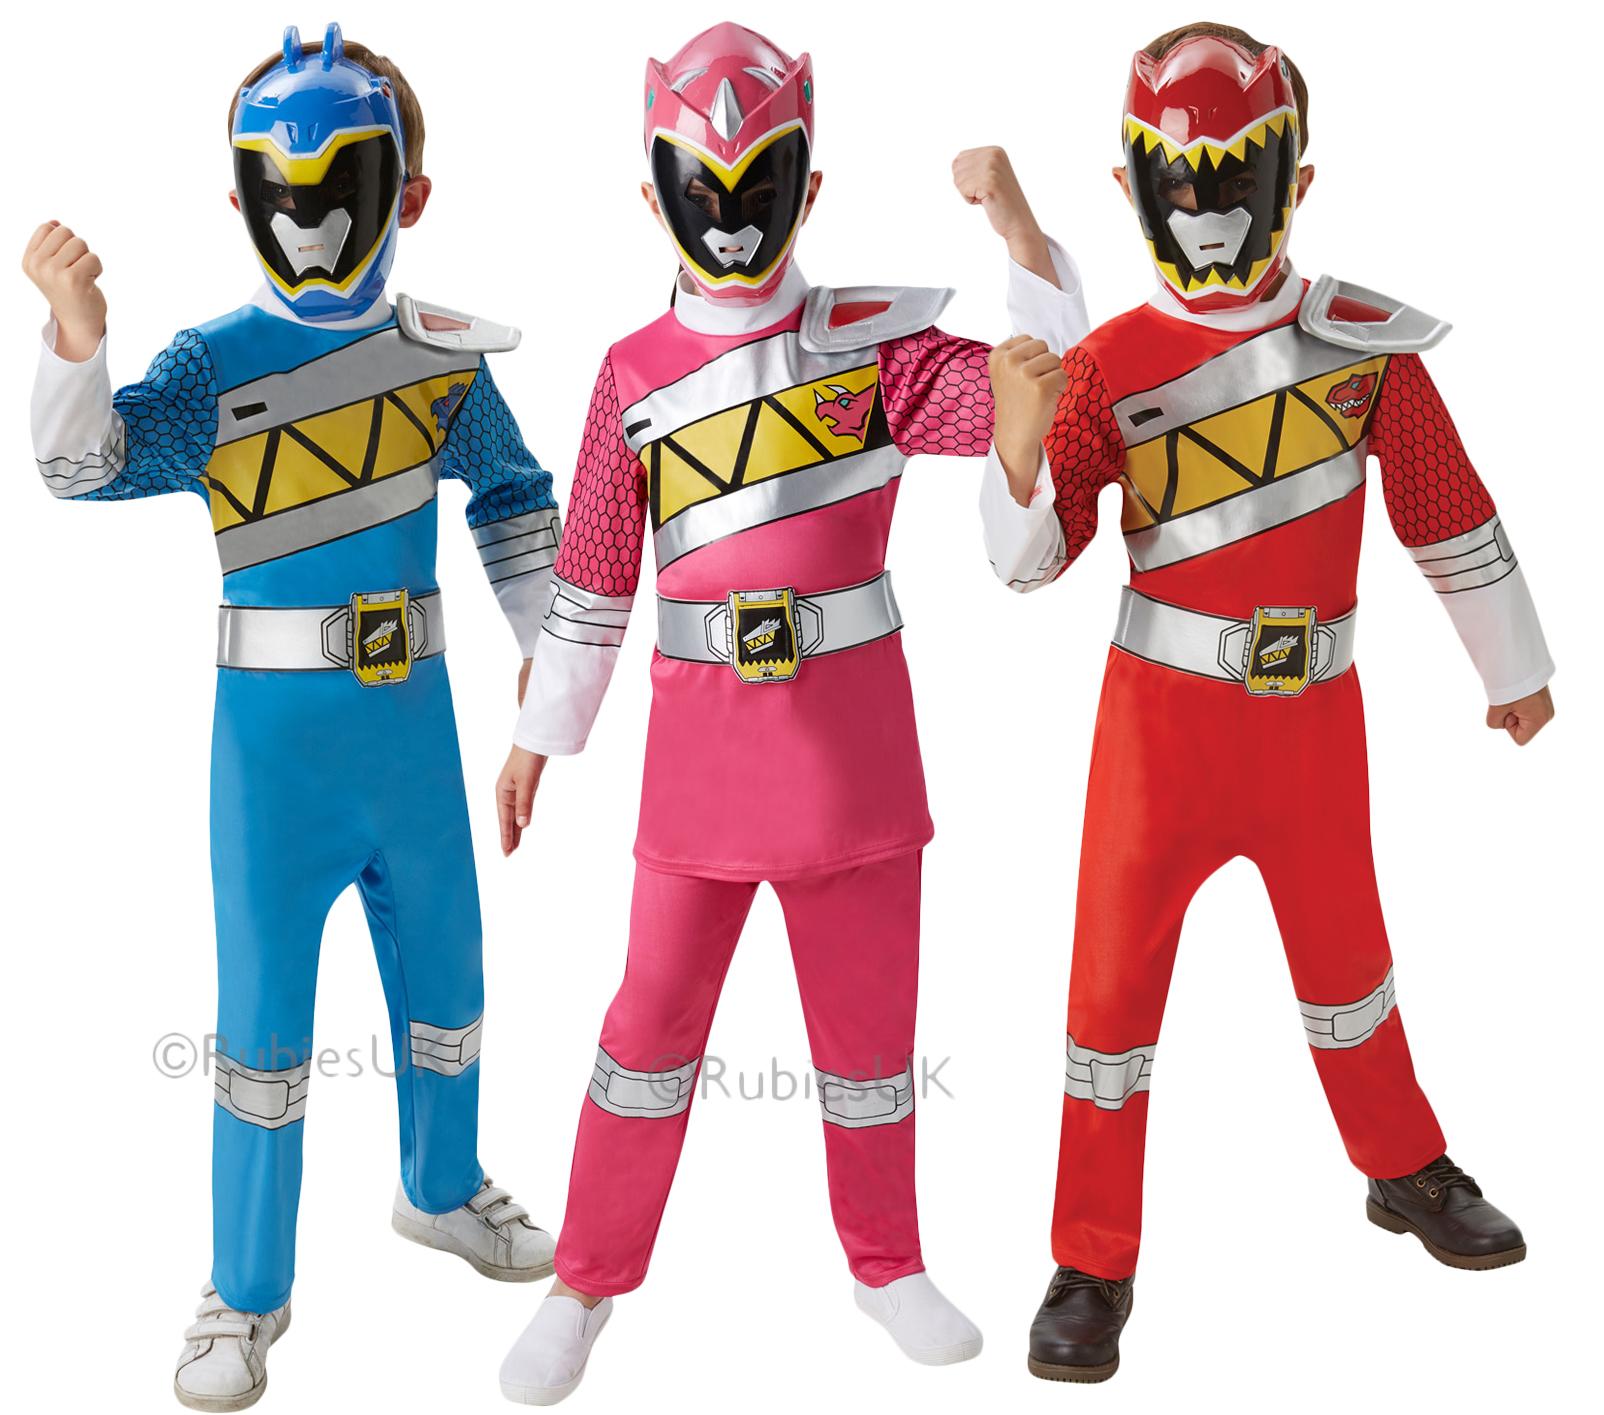 - New Dino Charge Power Ranger Fancy Dress Superhero Rangers Kids